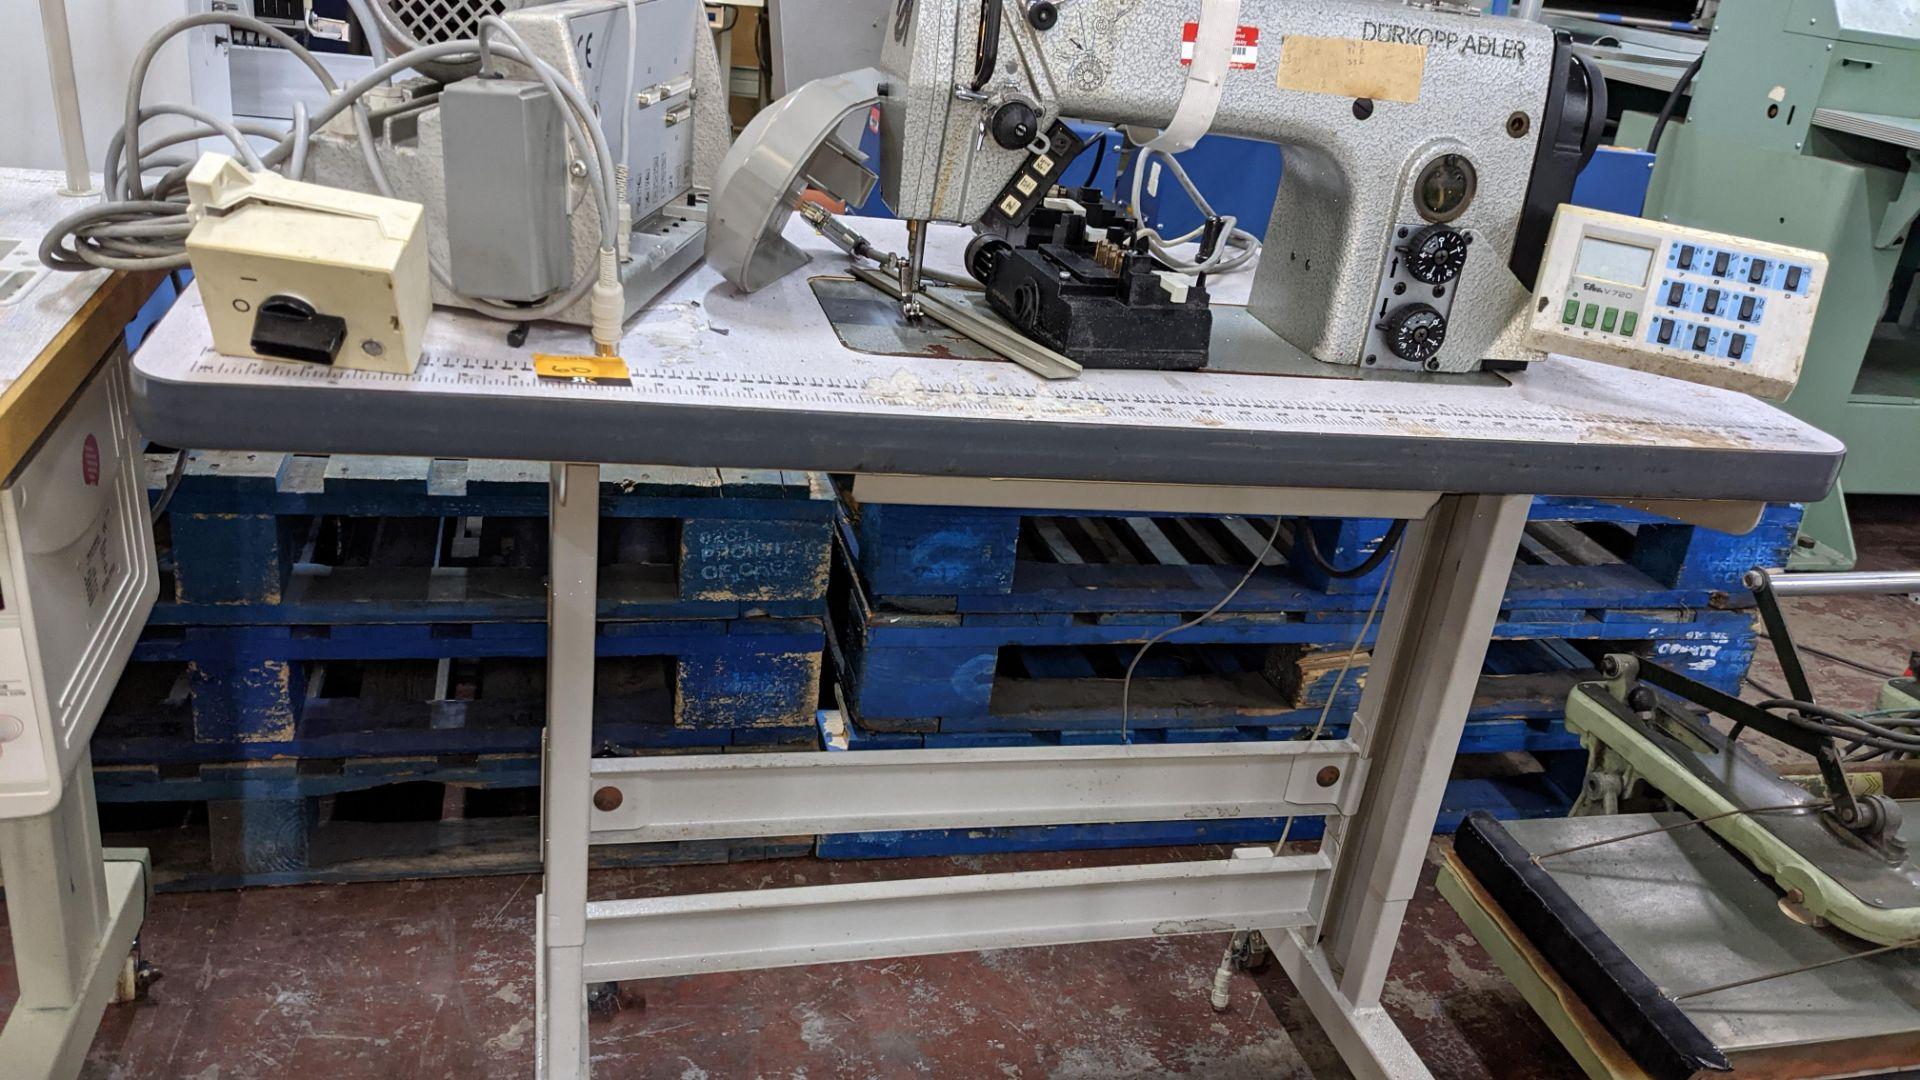 Durkopp Adler type 0271-L40042 sewing machine - Image 17 of 19